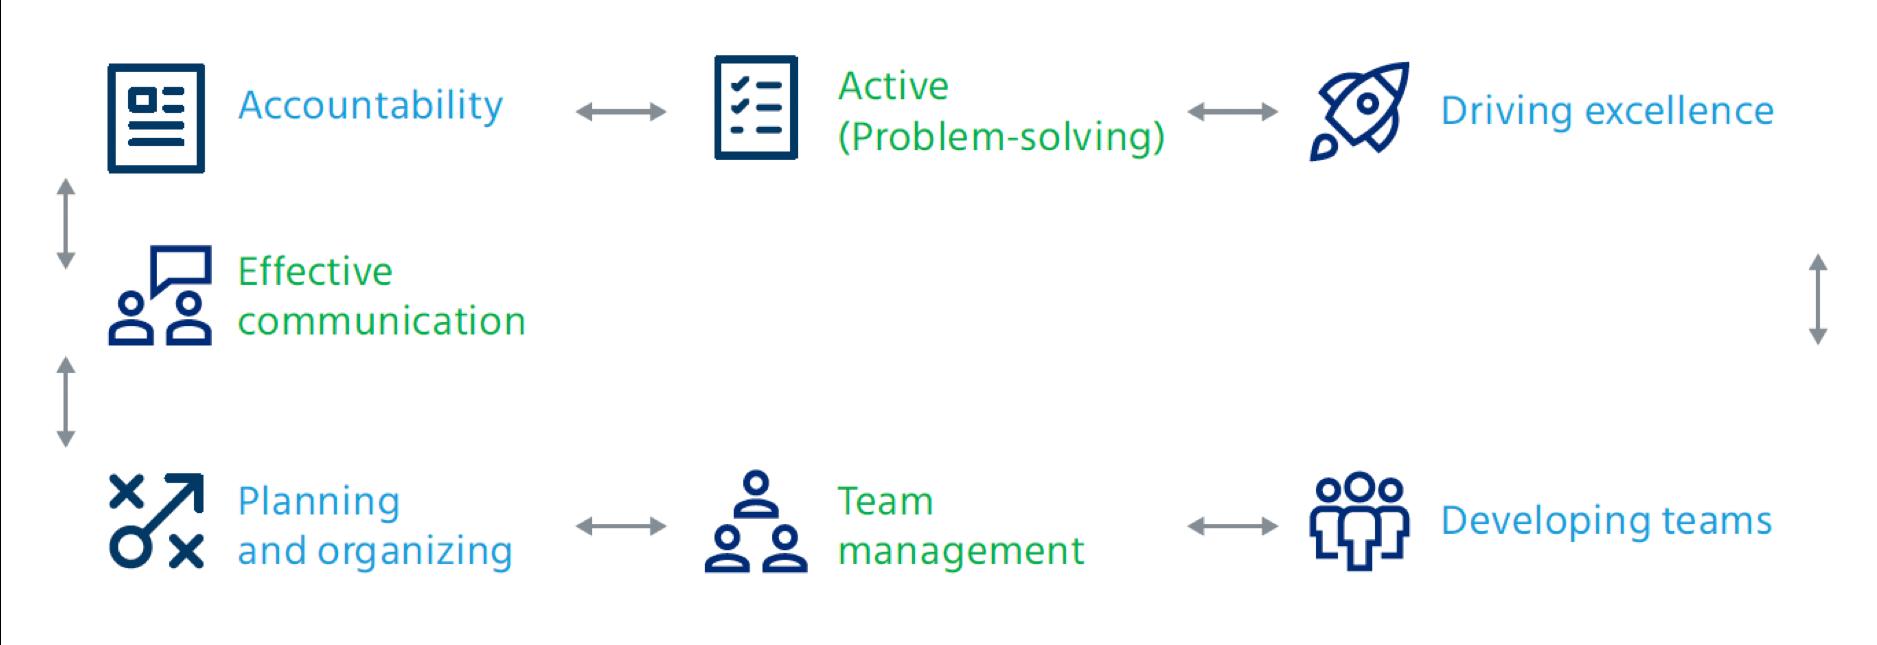 Choose Mercer | Mettl's 360 survey template based on competency framework for IT team leads